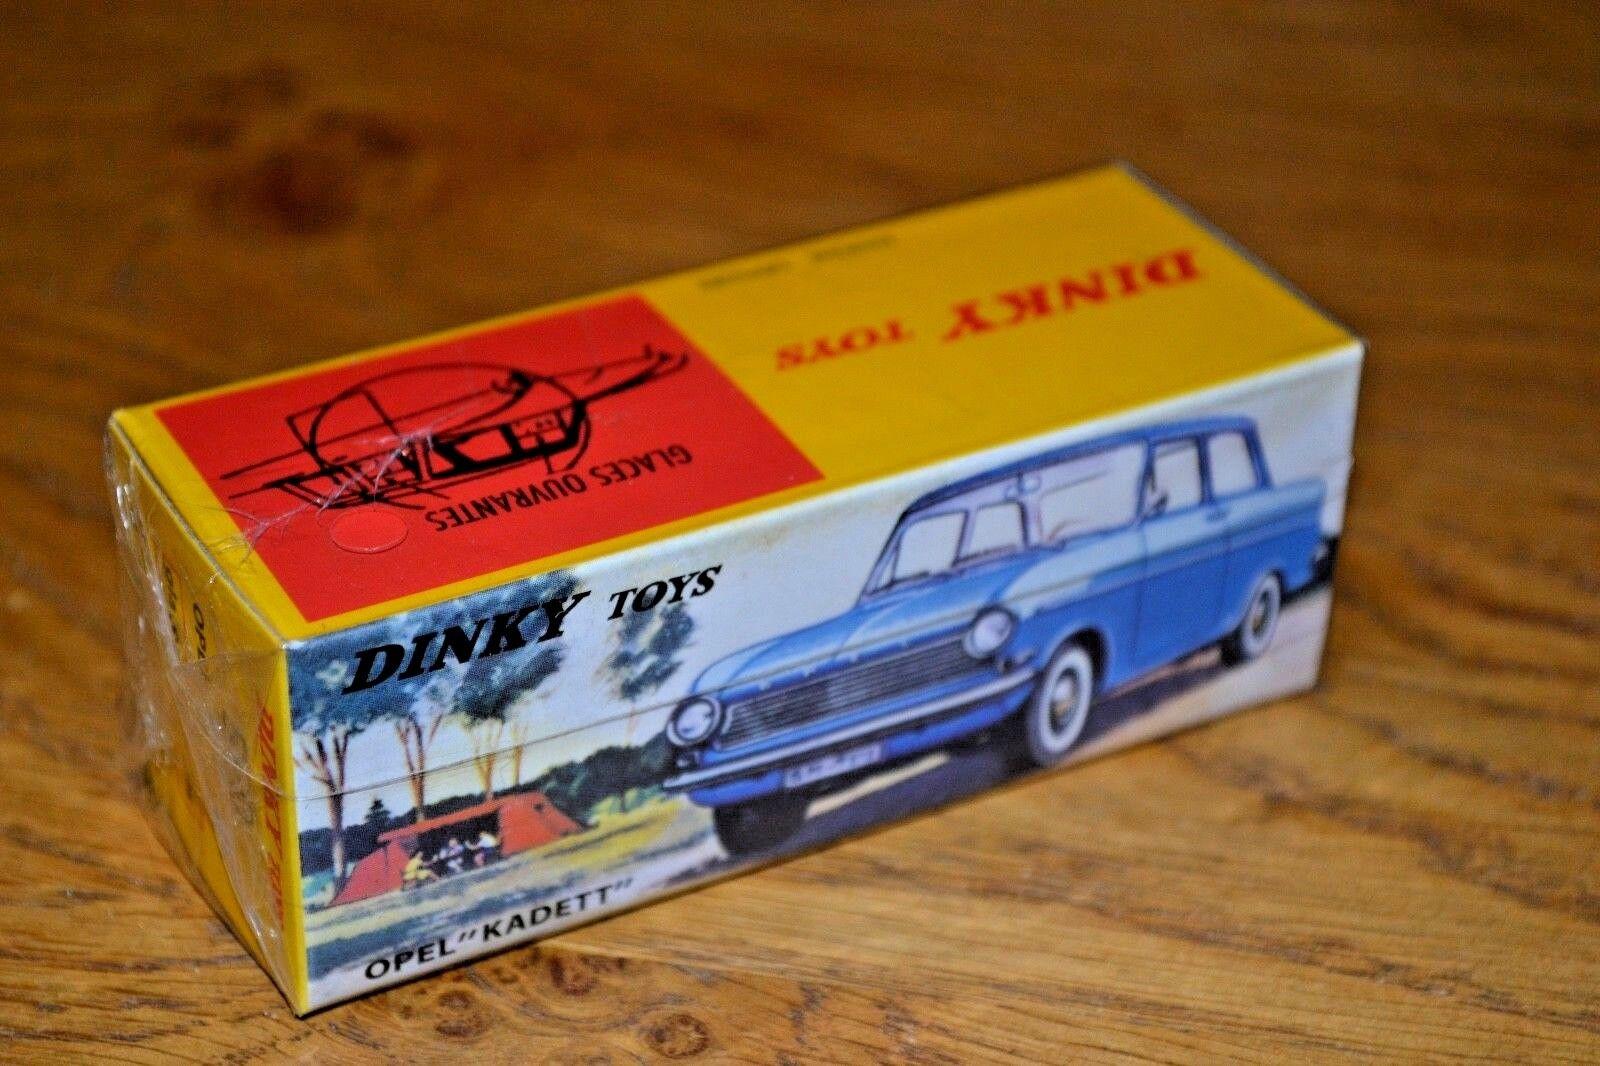 French Dinky Toys Atlas Edition Diecast Opel Kadett No. 540 New Unopened